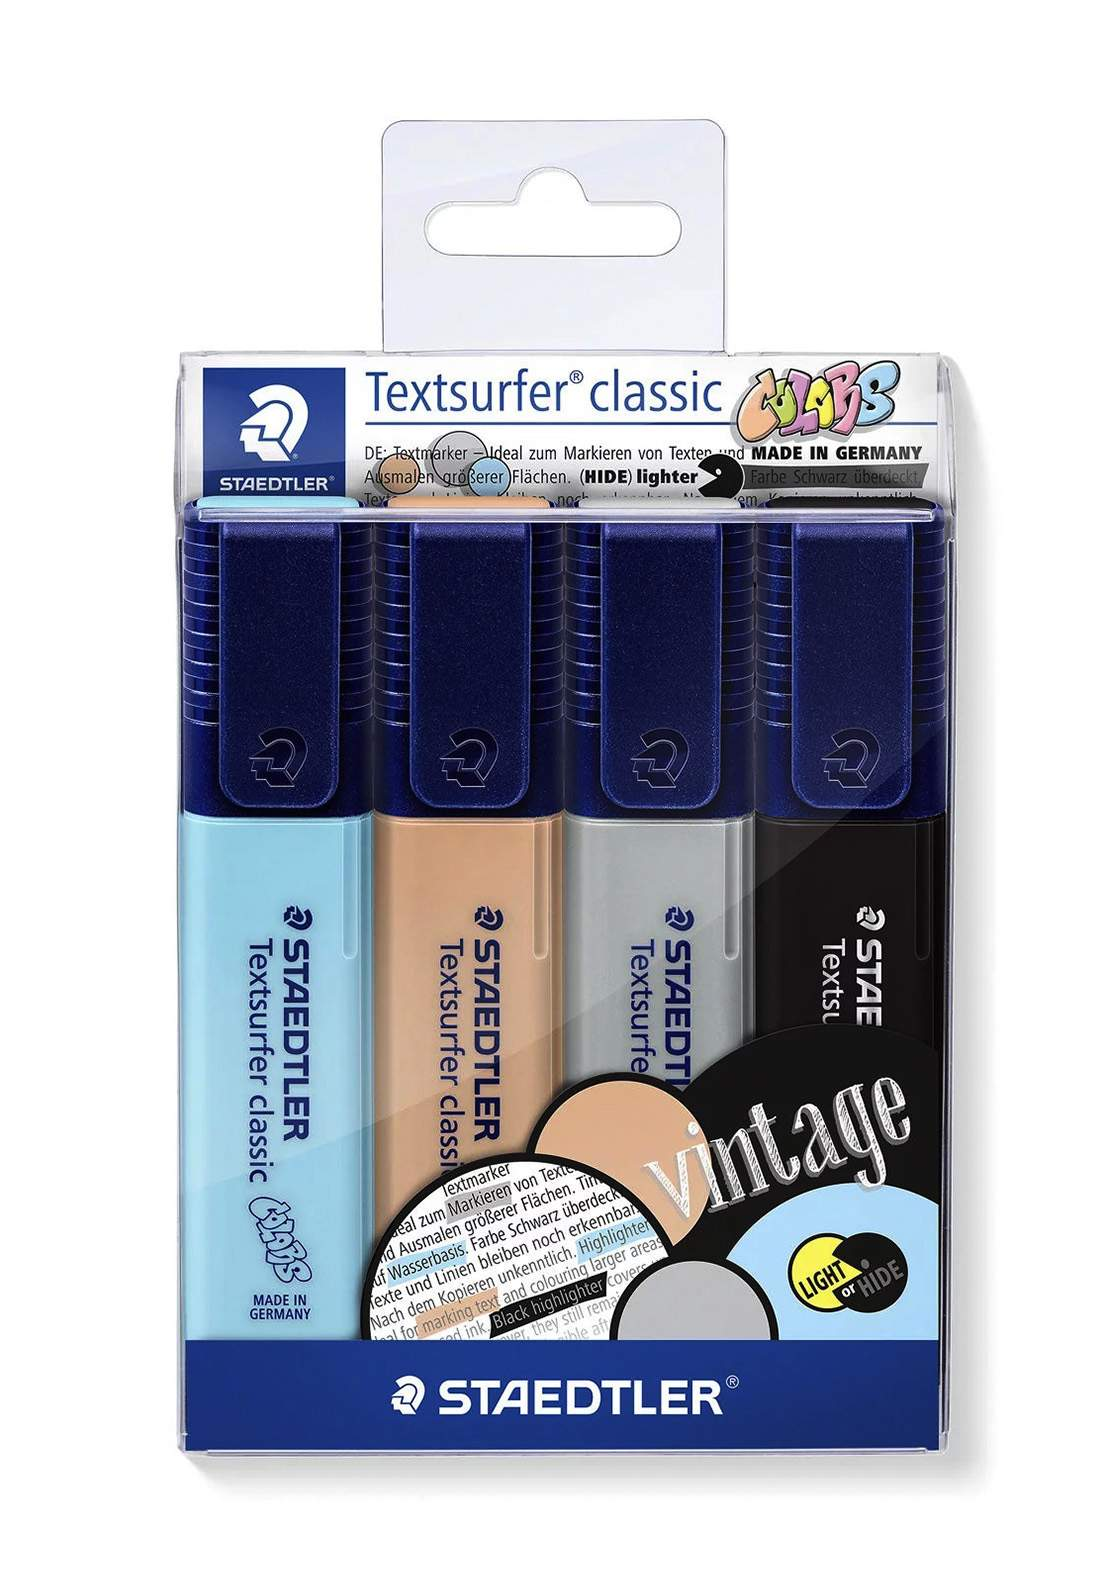 Staedtler 364CWP4 - 4 Pcs  أقلام تأشير